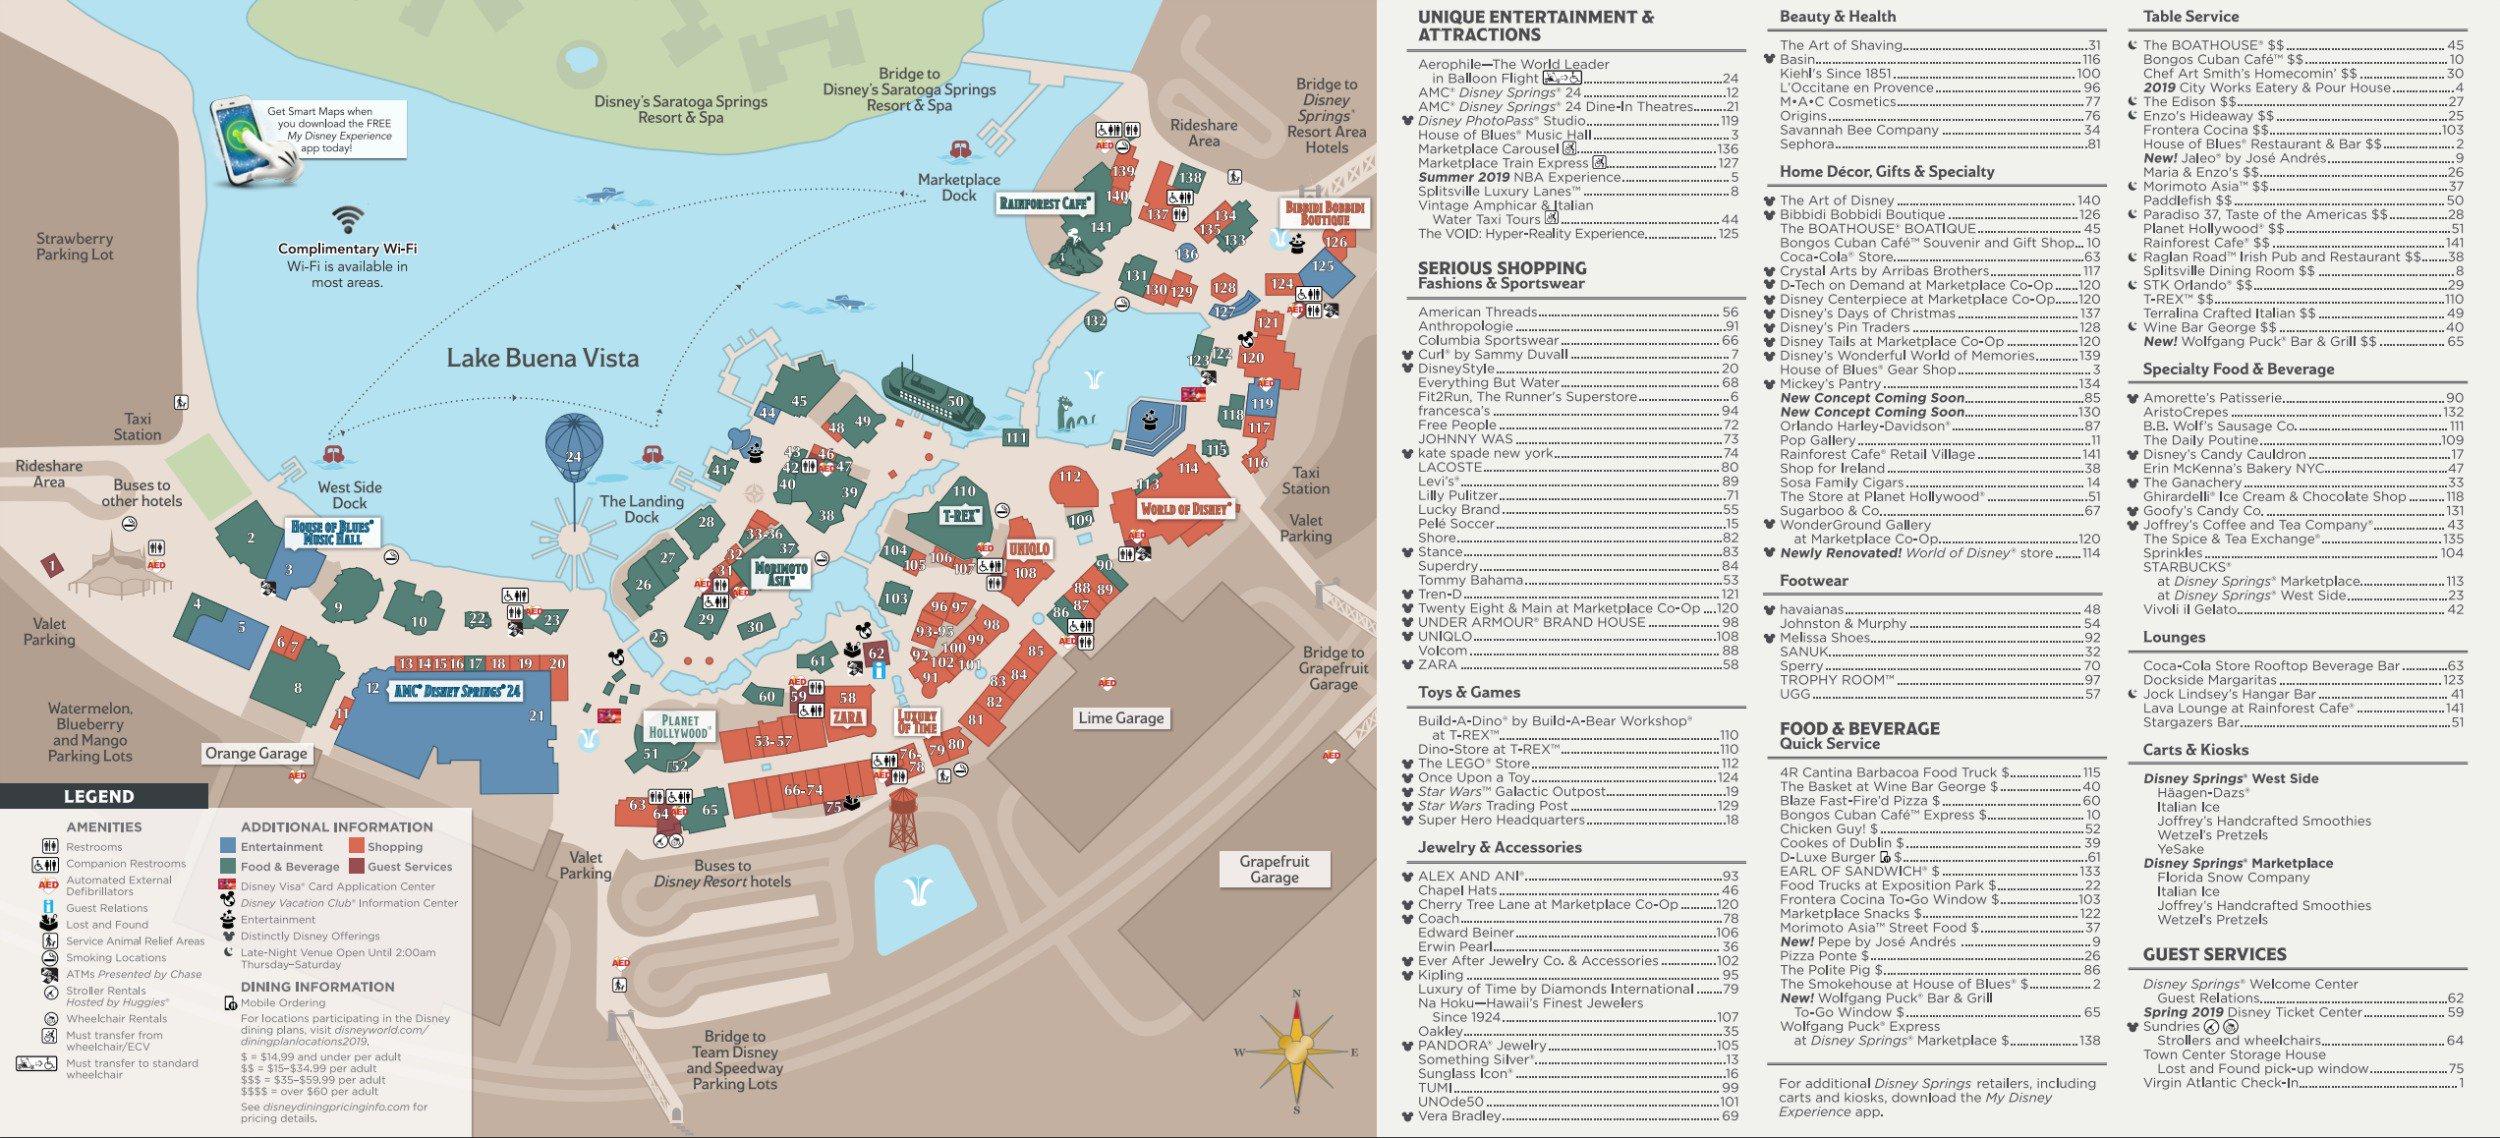 Disney Springs Map - Walt Disney World - Disney Springs Florida Map